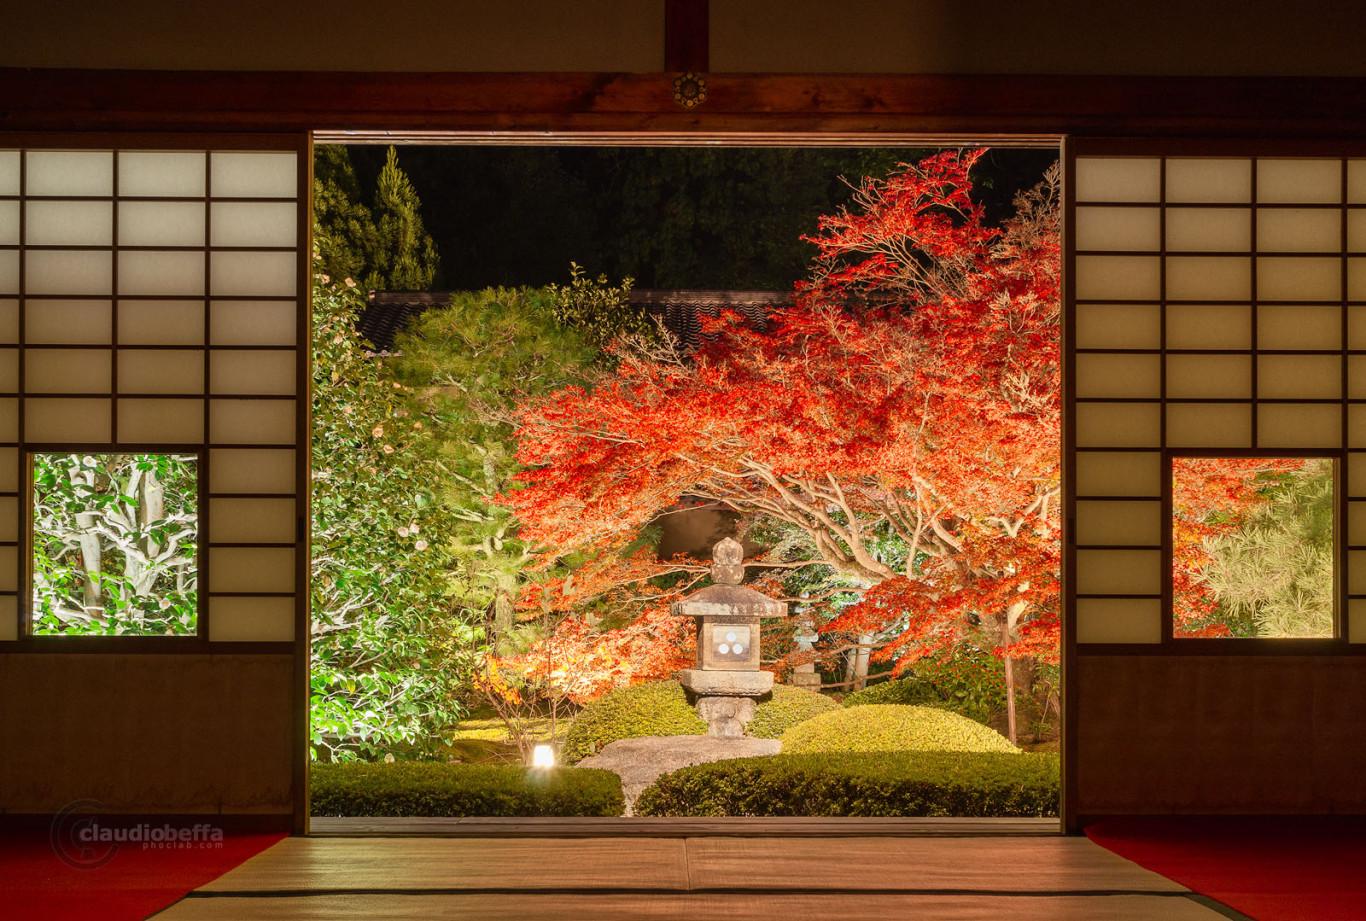 Unryuin Kyoto Lightup Garden Shoji Autumn Momiji Tsubaki Pine Lantern Japan